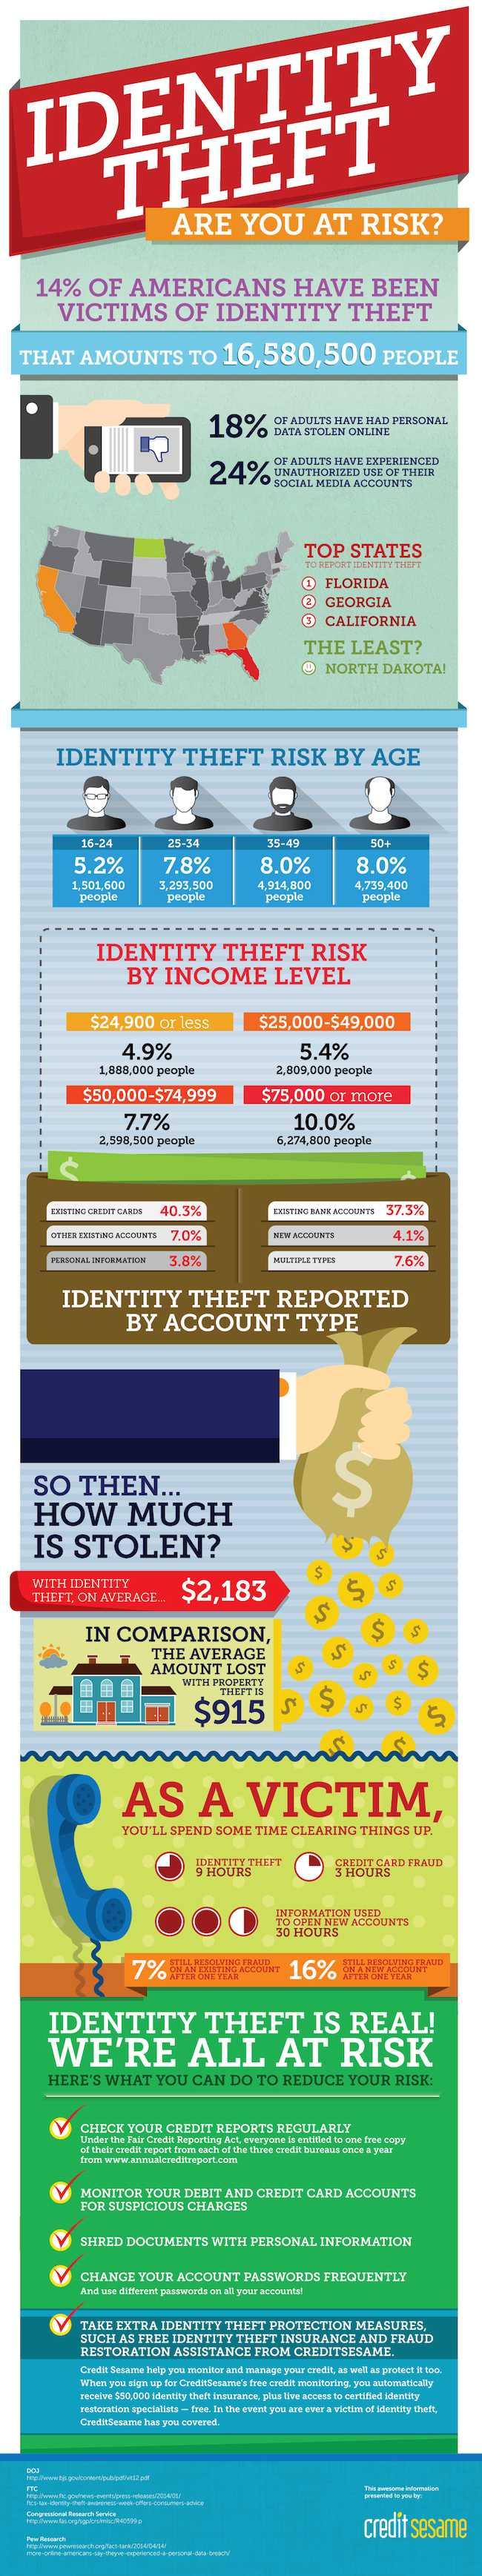 credit-sesame-identity-theft